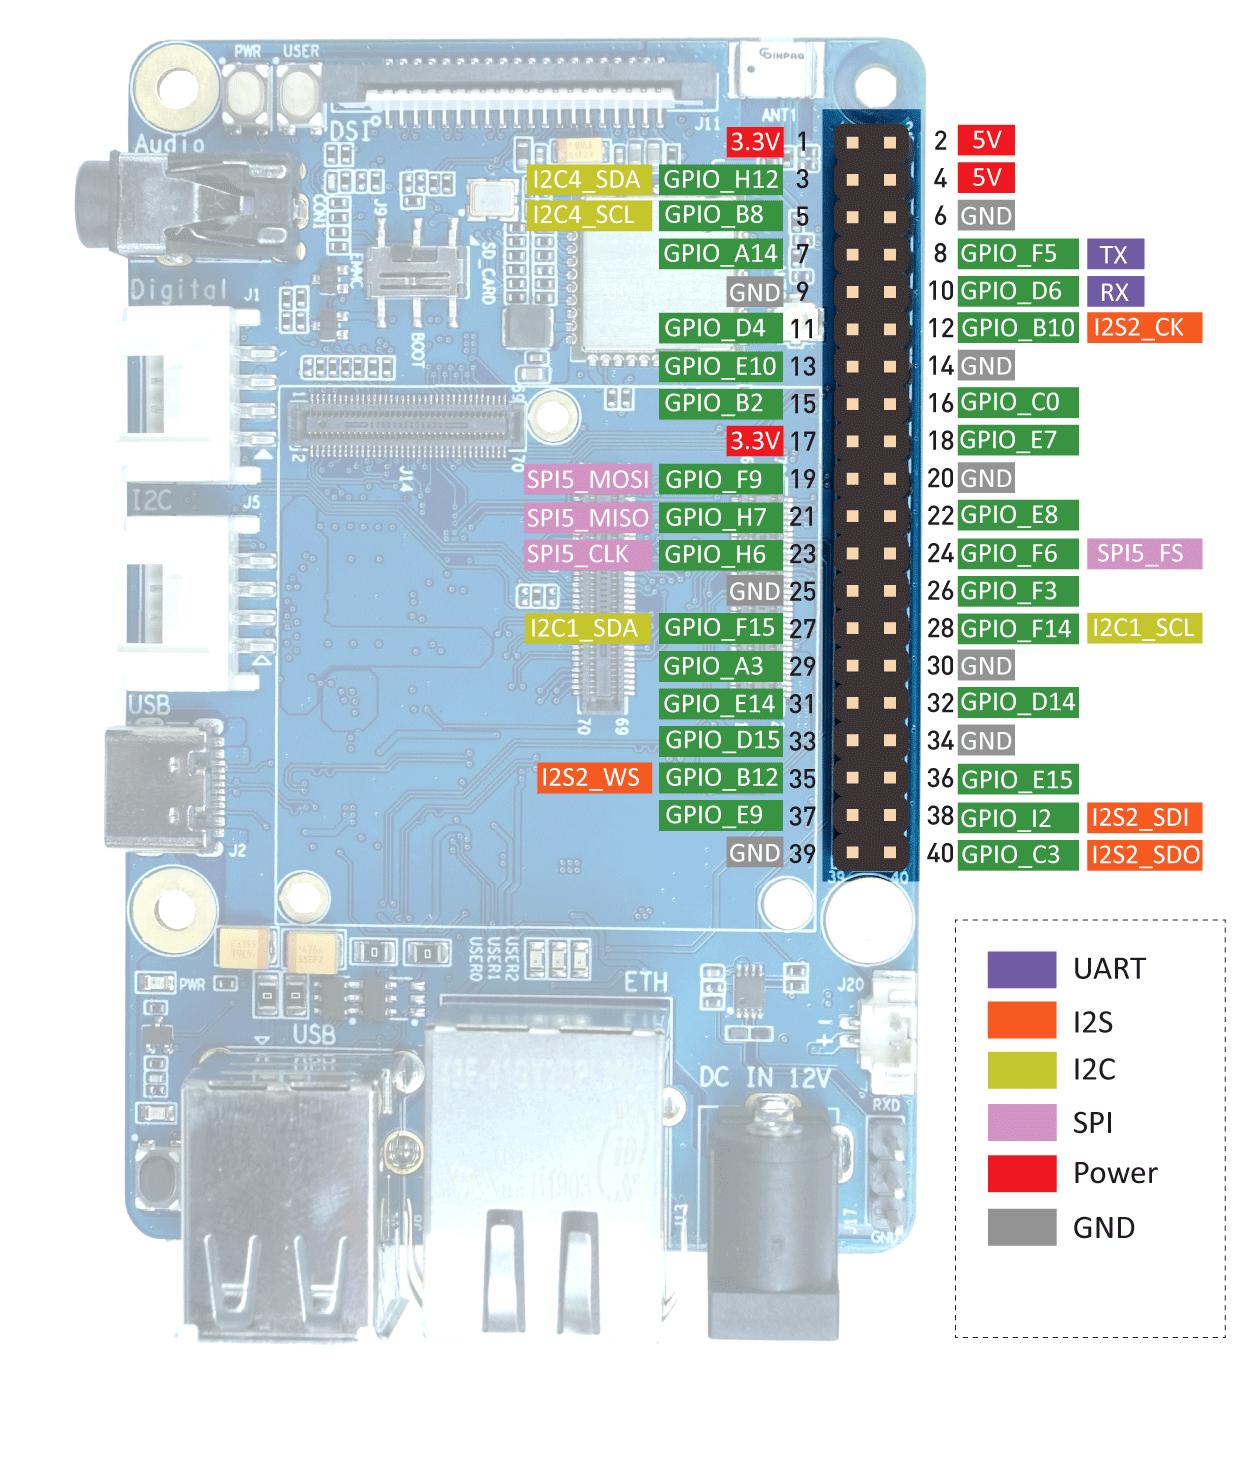 ODYSSEY-STM32P157C Pinout Diagram